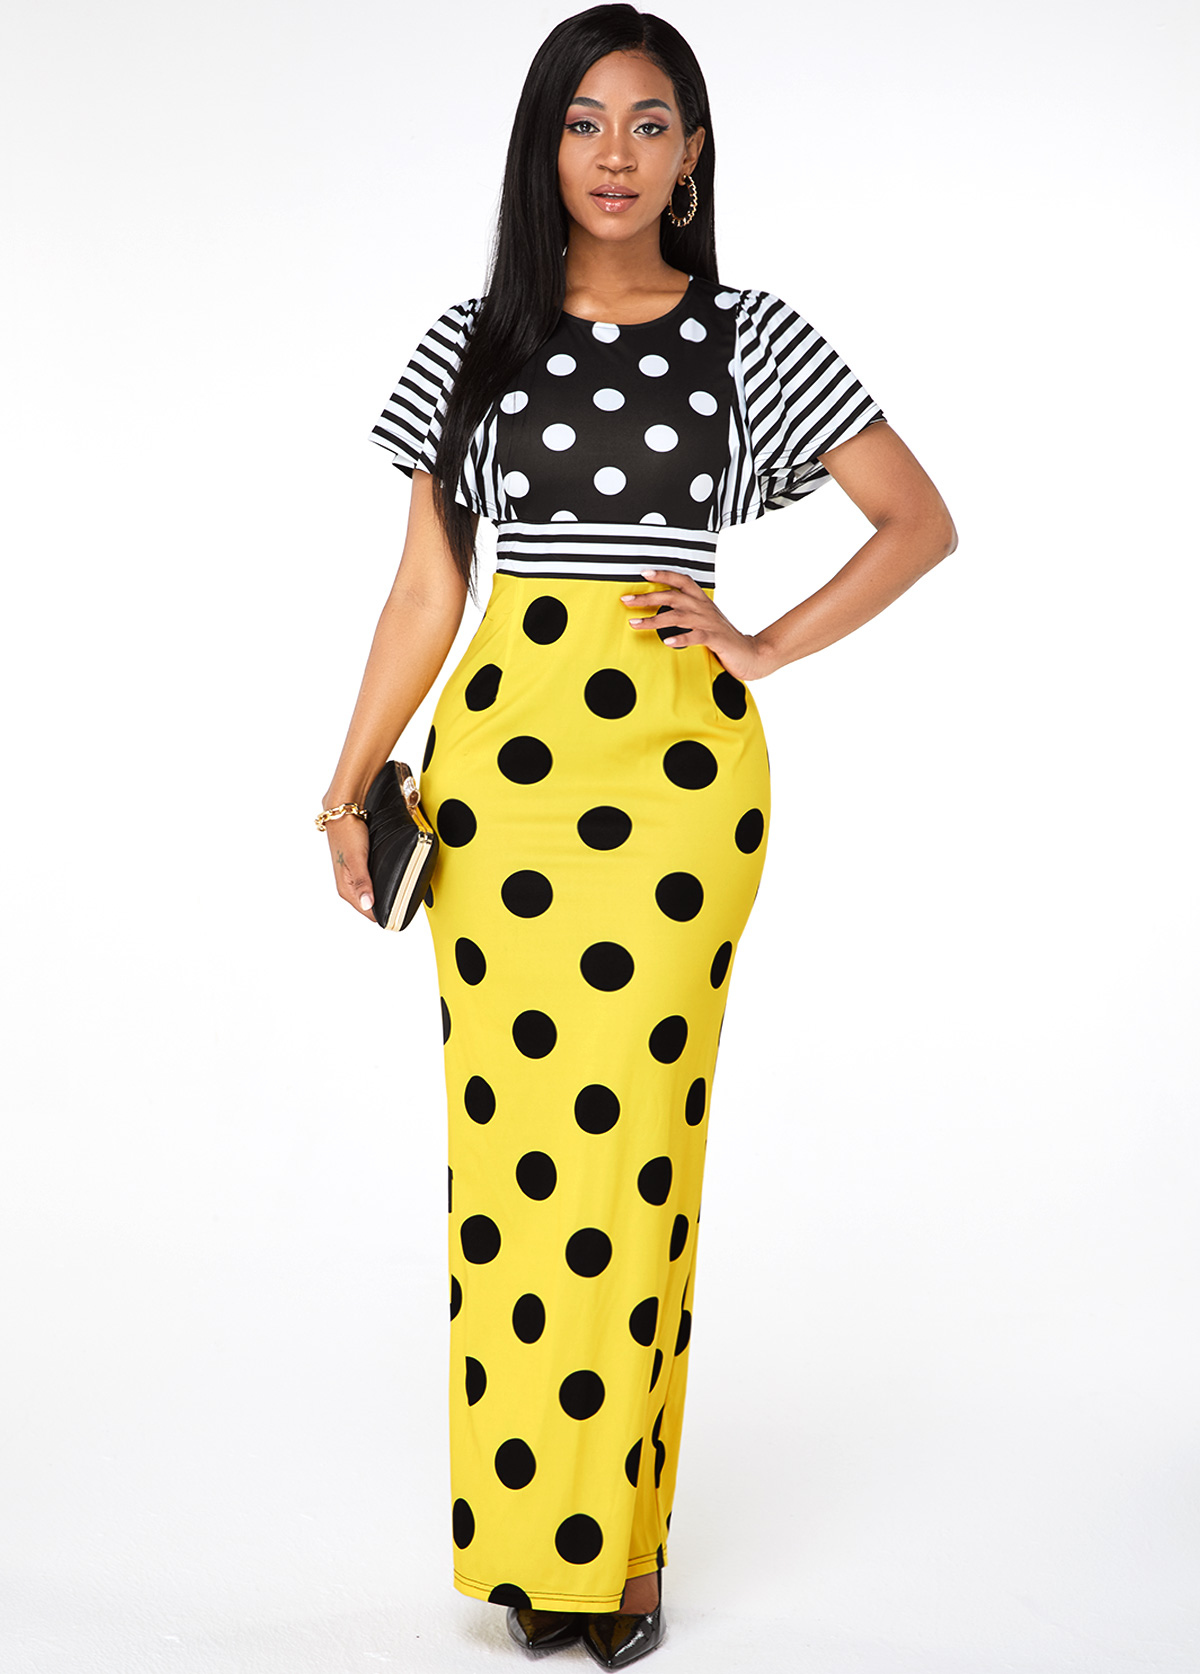 ROTITA Back Slit Short Sleeve Polka Dot Dress